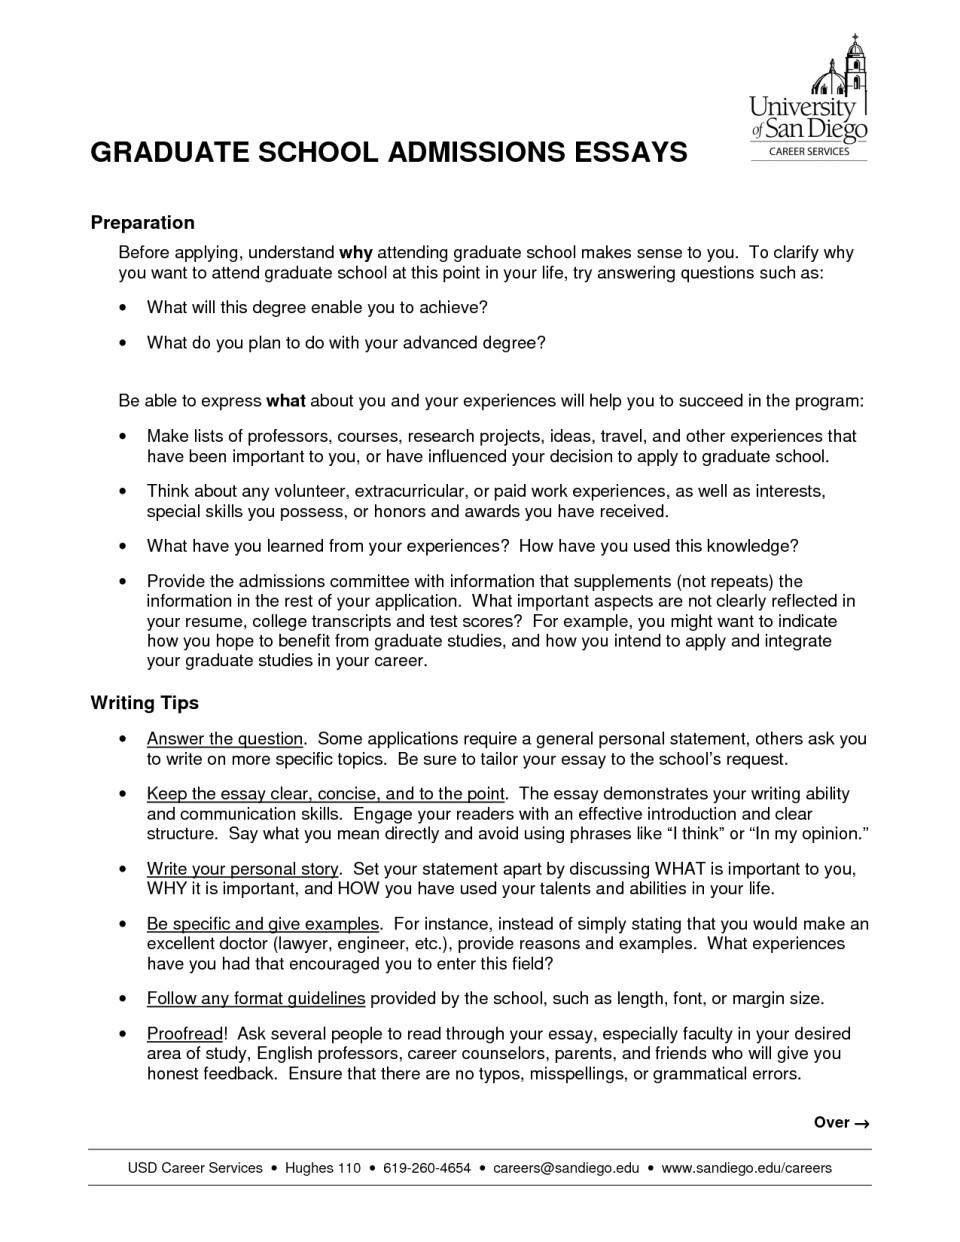 Graduate school essay review service